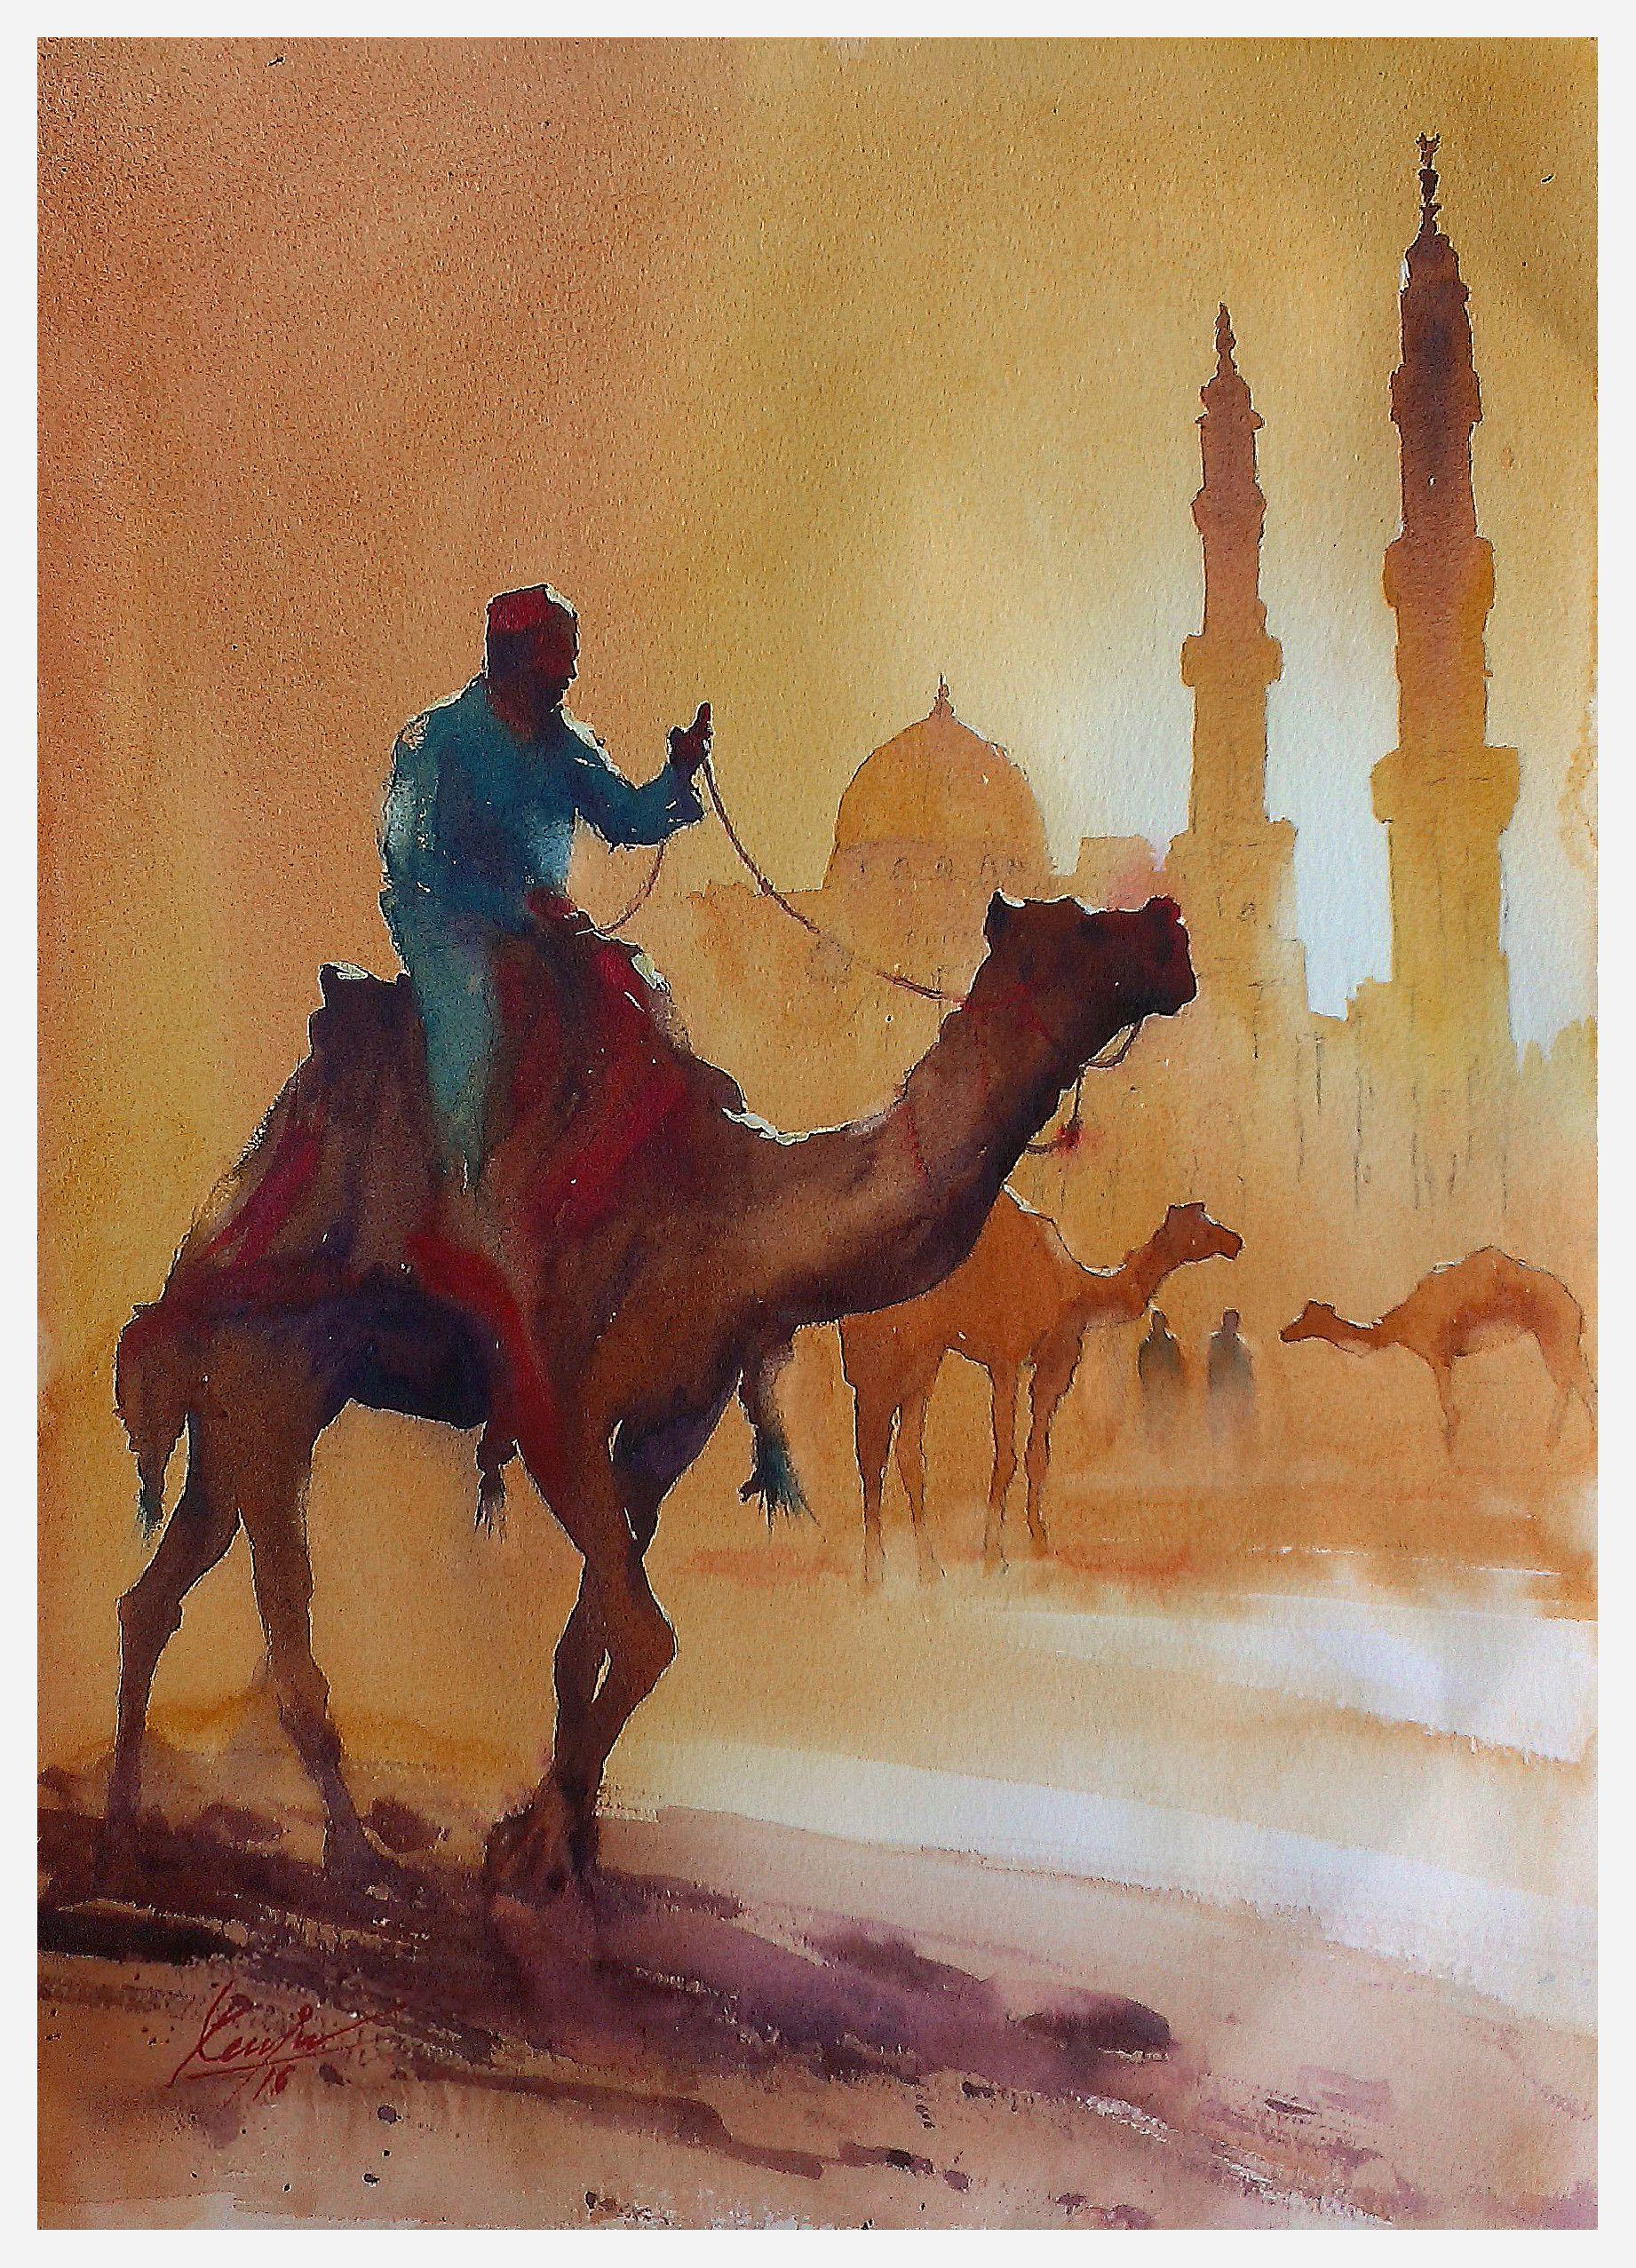 Artstation Watercolor Paintings Mv Renju Watercolor Paintings Nature Islamic Paintings Egyptian Art